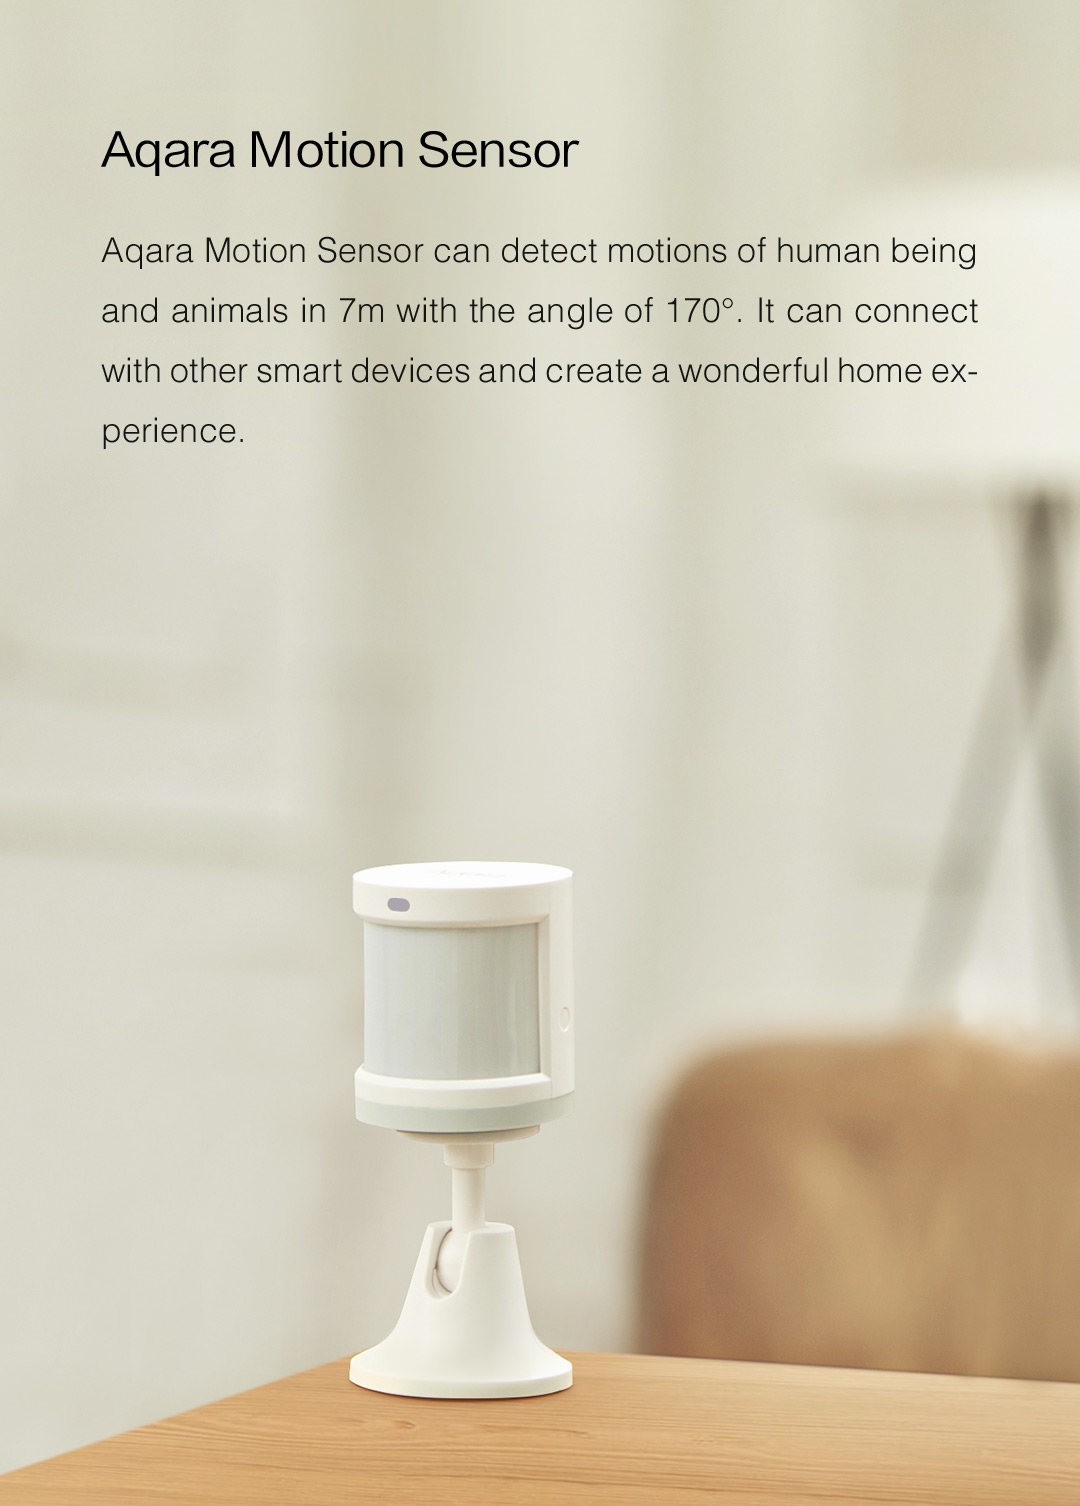 Aqara human motion sensor - detects human body and motion in real time.